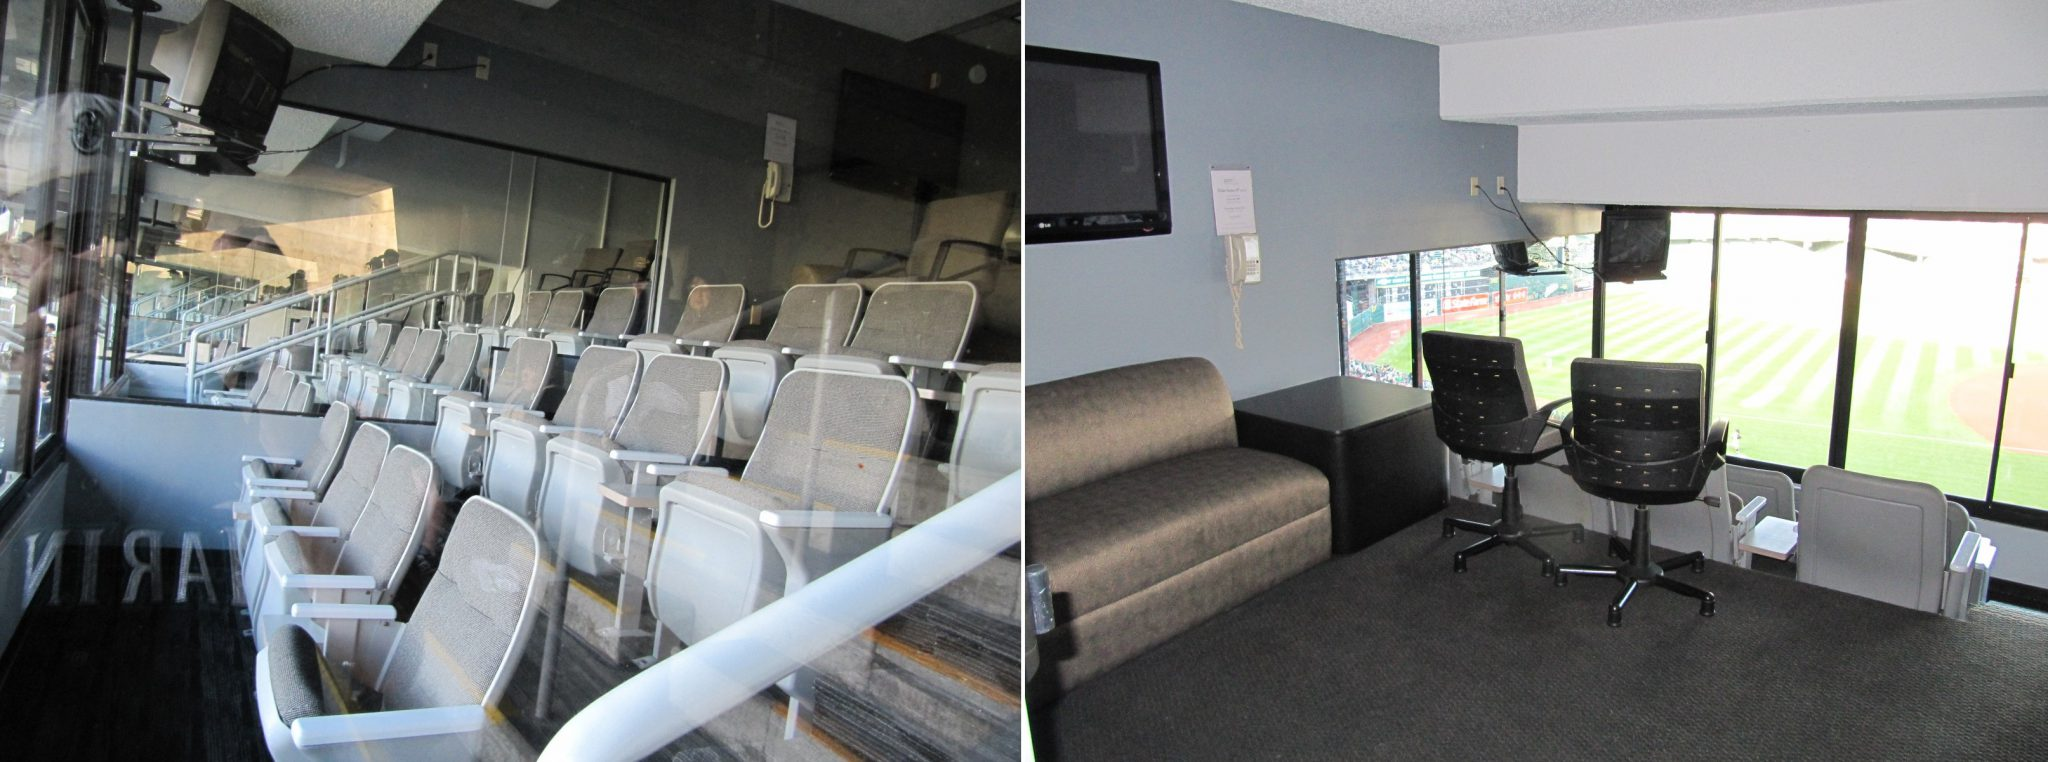 Oakland Alameda County Coliseum luxury suite